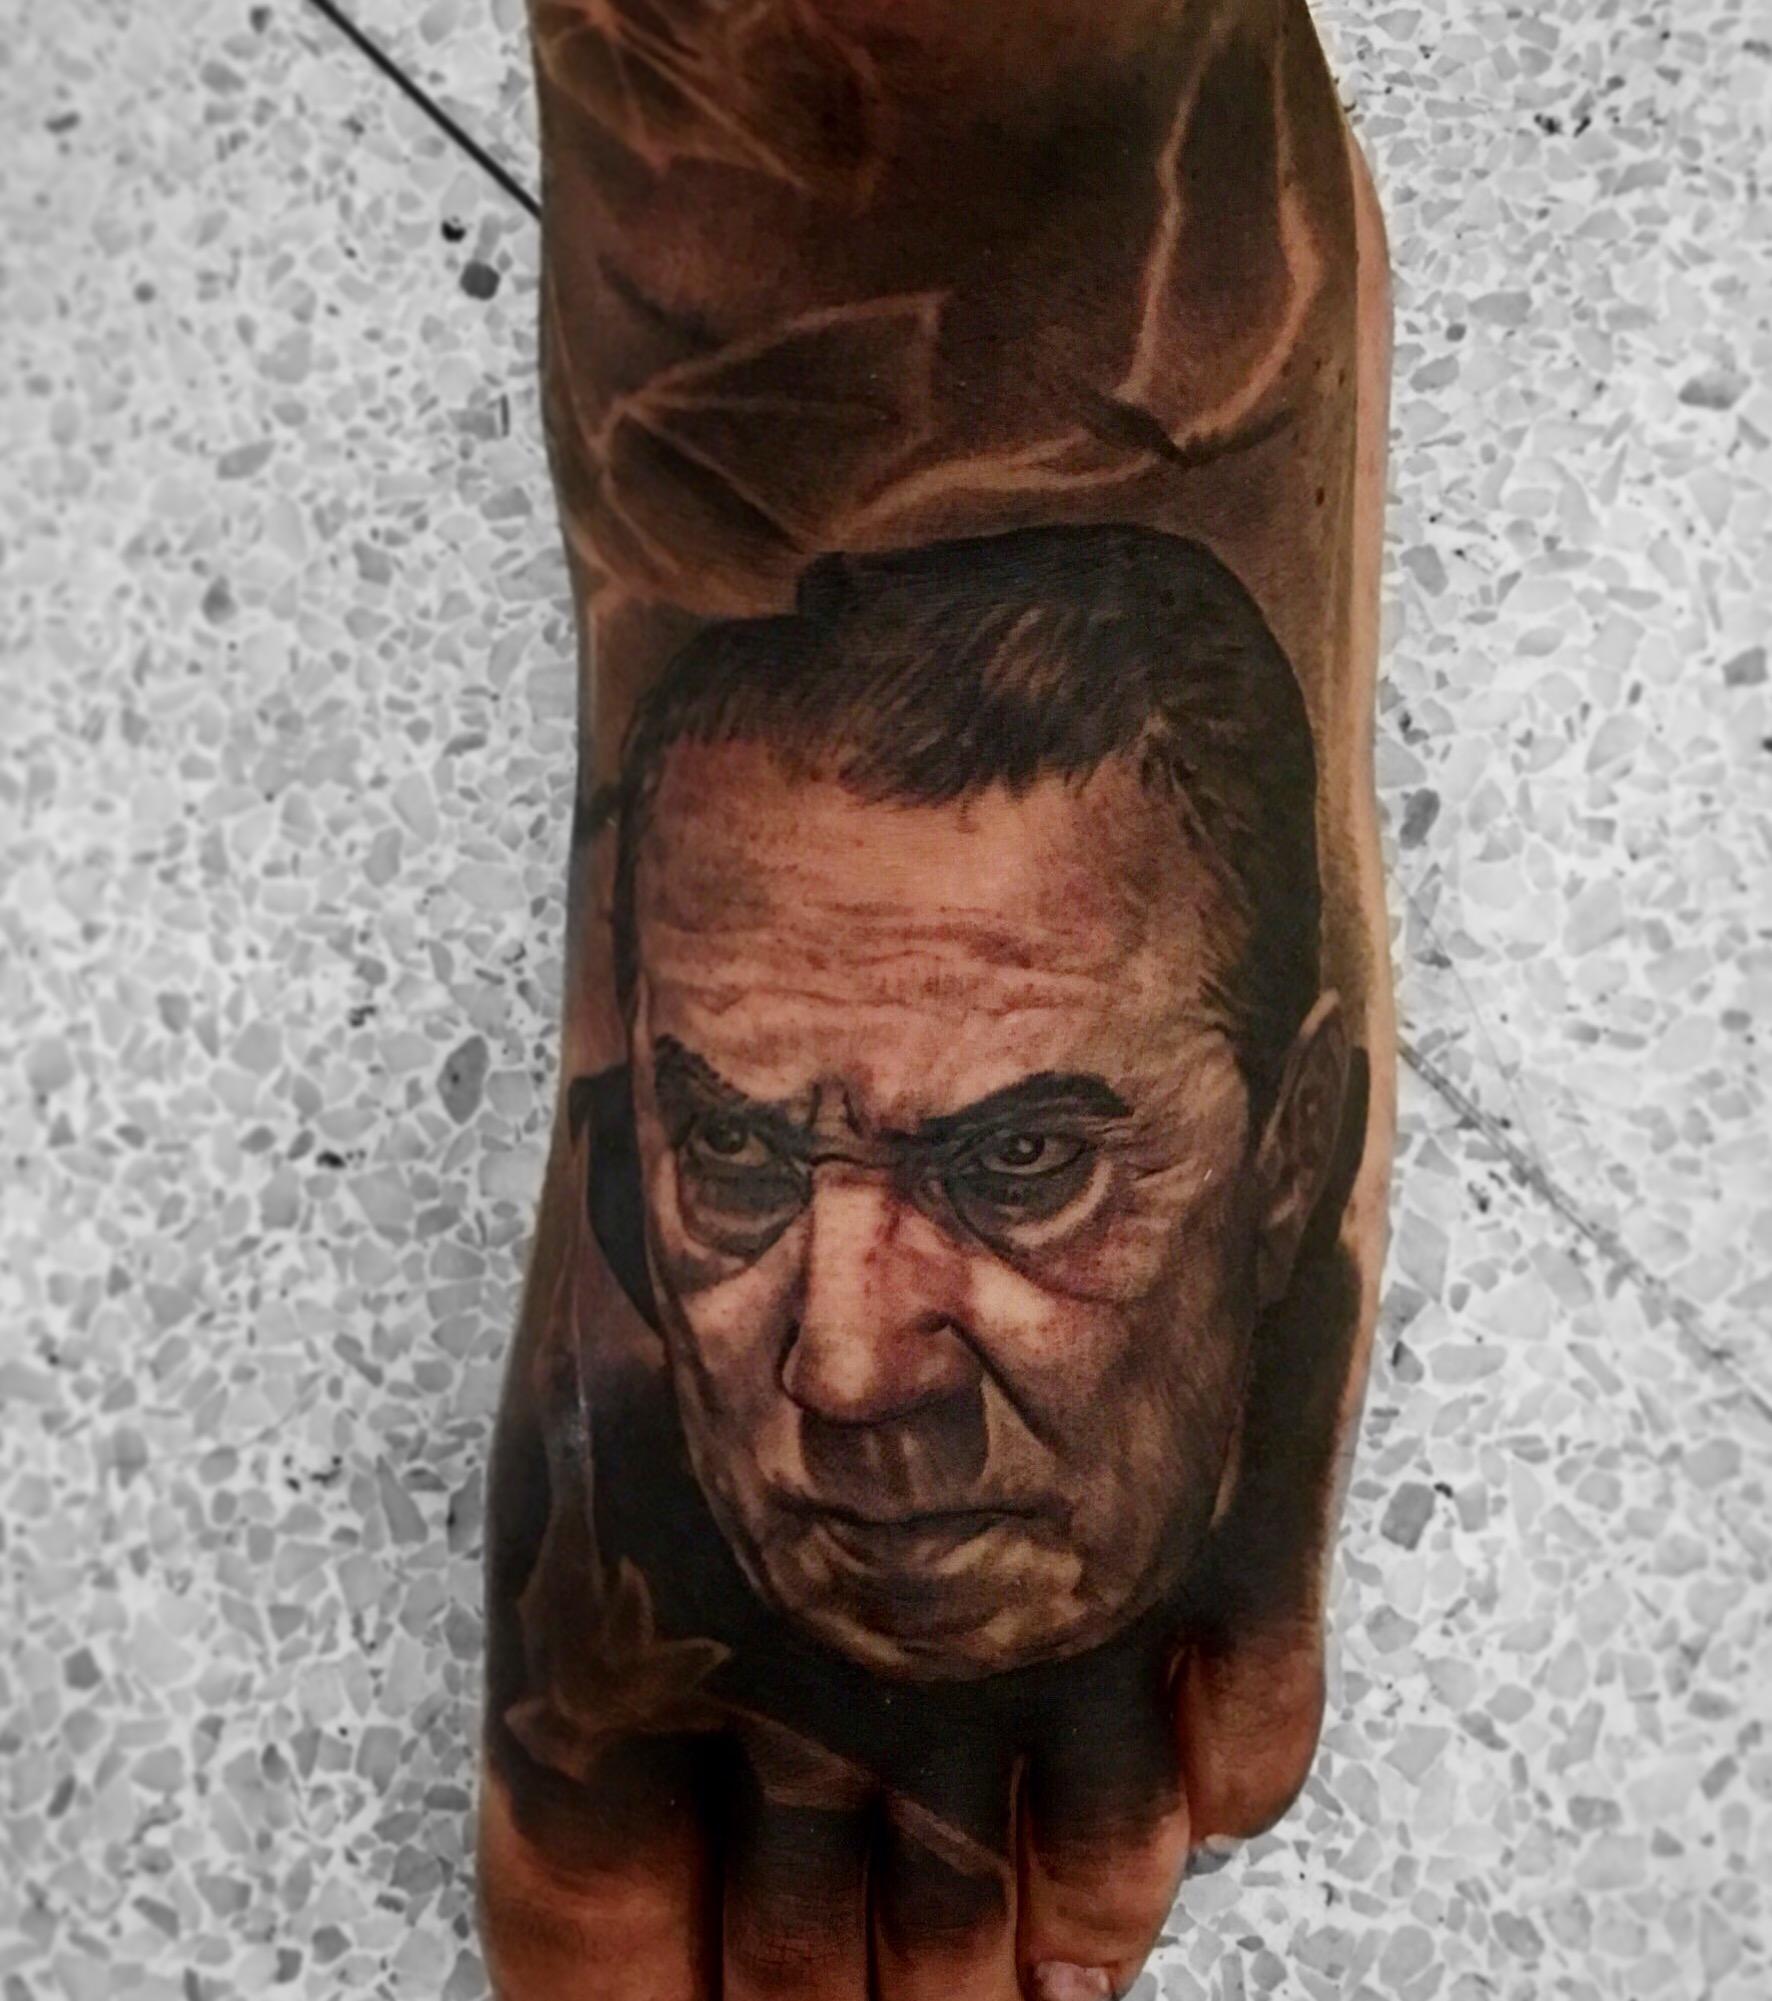 Dane karlson magik 5 tattoo artist profile for Tattoo artist in fort lauderdale